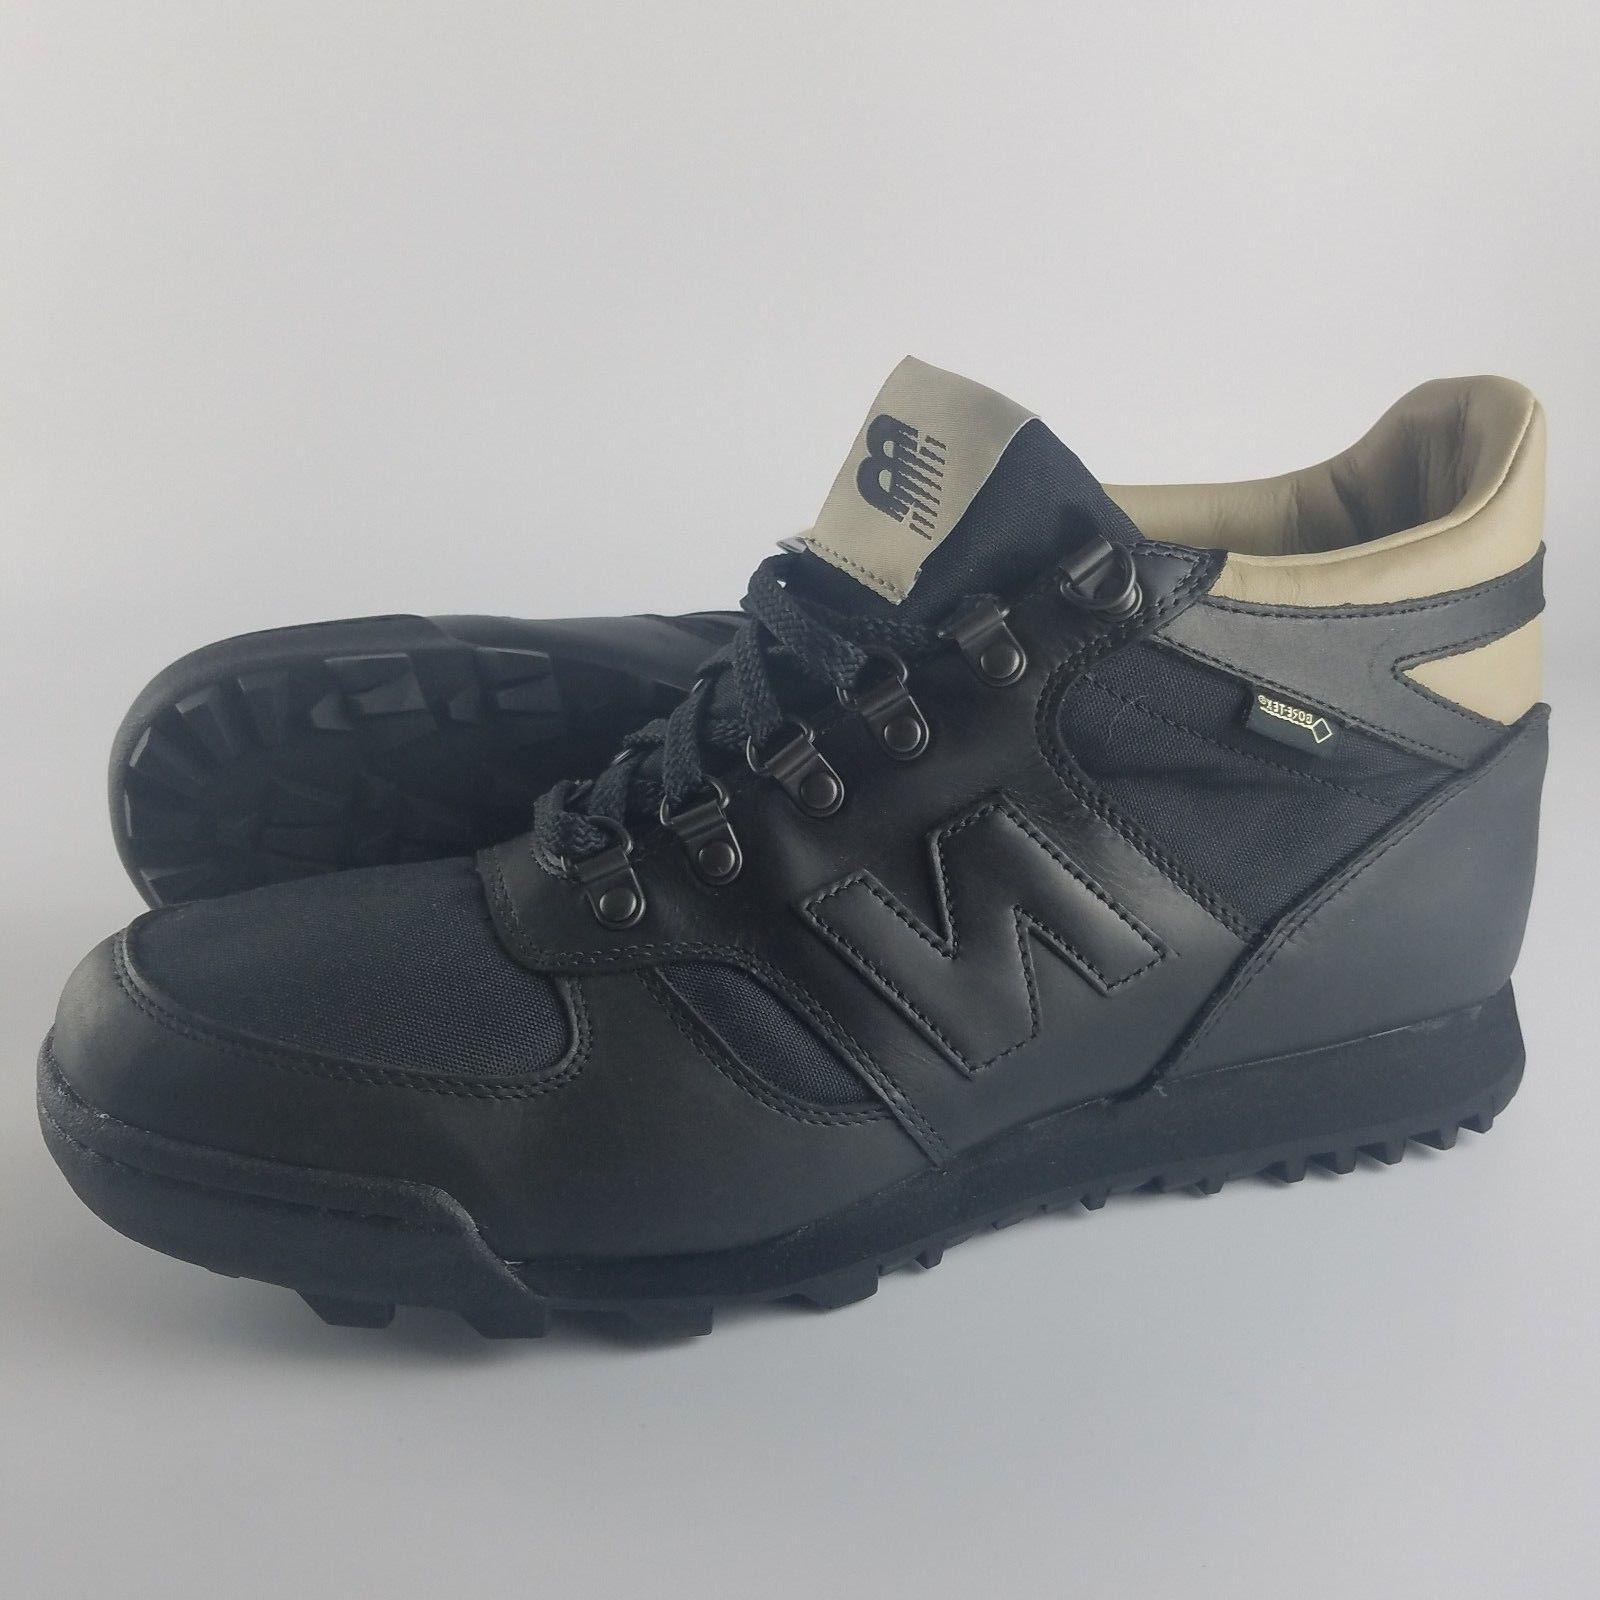 New Balance Rainier Remastered Trail Boots Men's Size 11.5 B